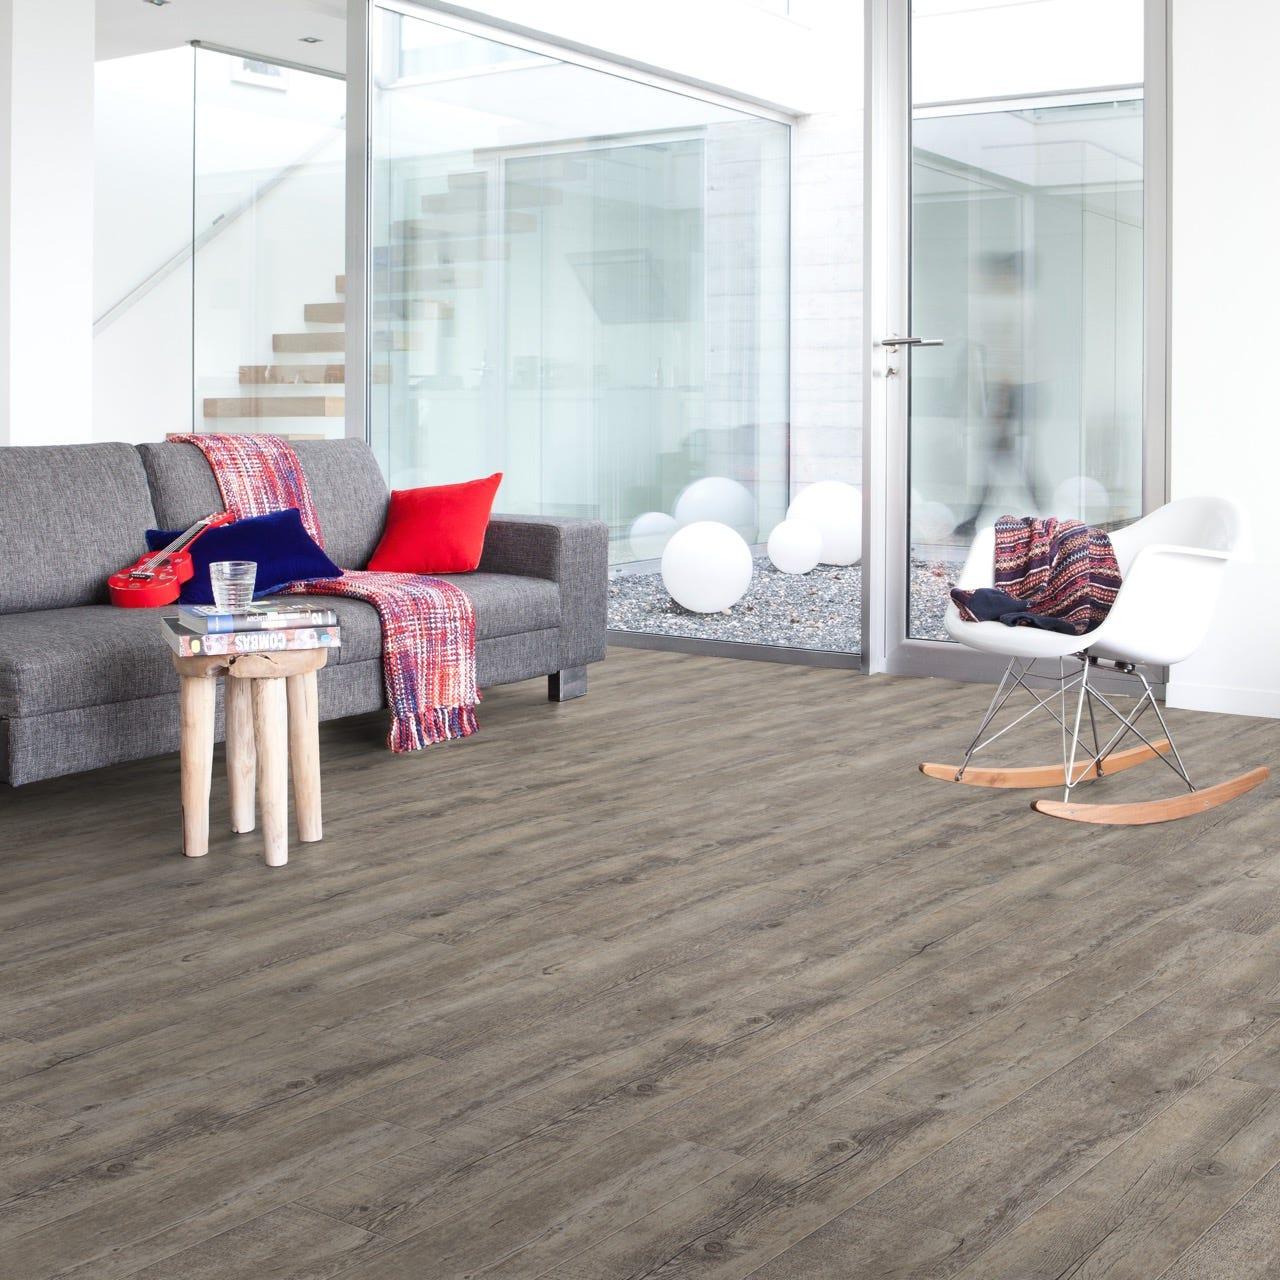 lame gerflor in pvc per pavimenti senso adjust 0511 pecan ebay. Black Bedroom Furniture Sets. Home Design Ideas